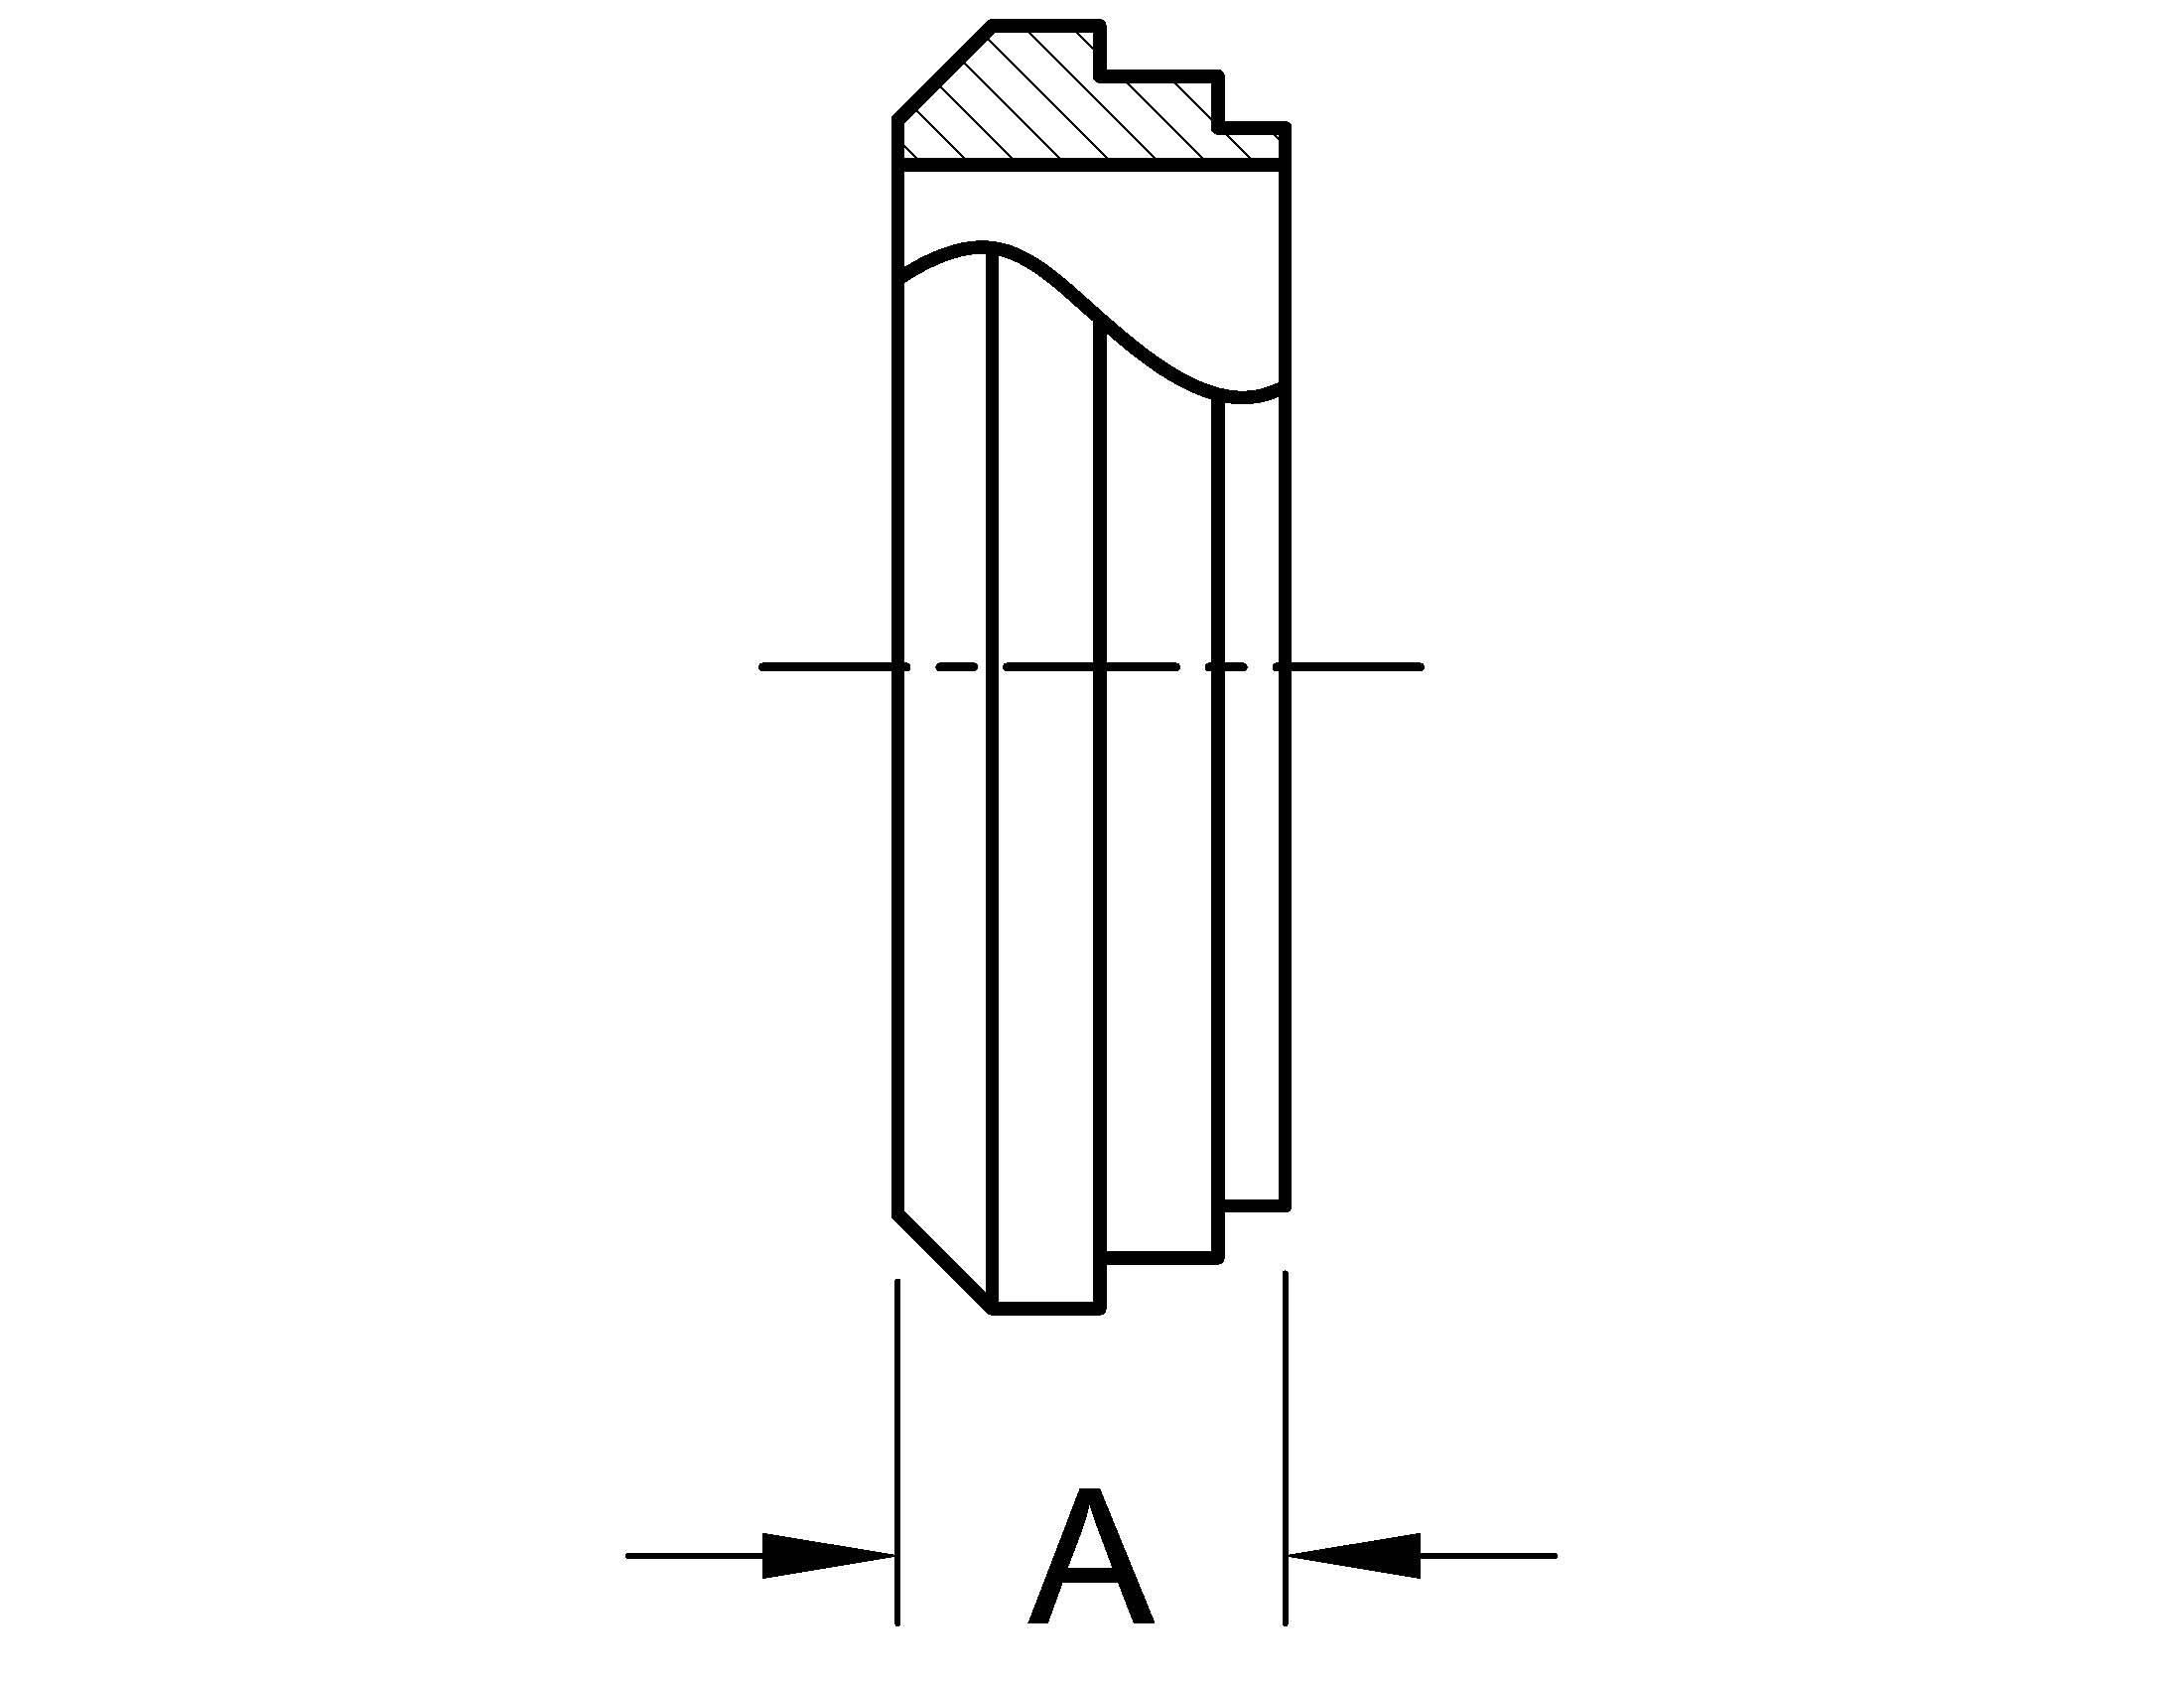 Short-Weld Bevel Seat Dimensions